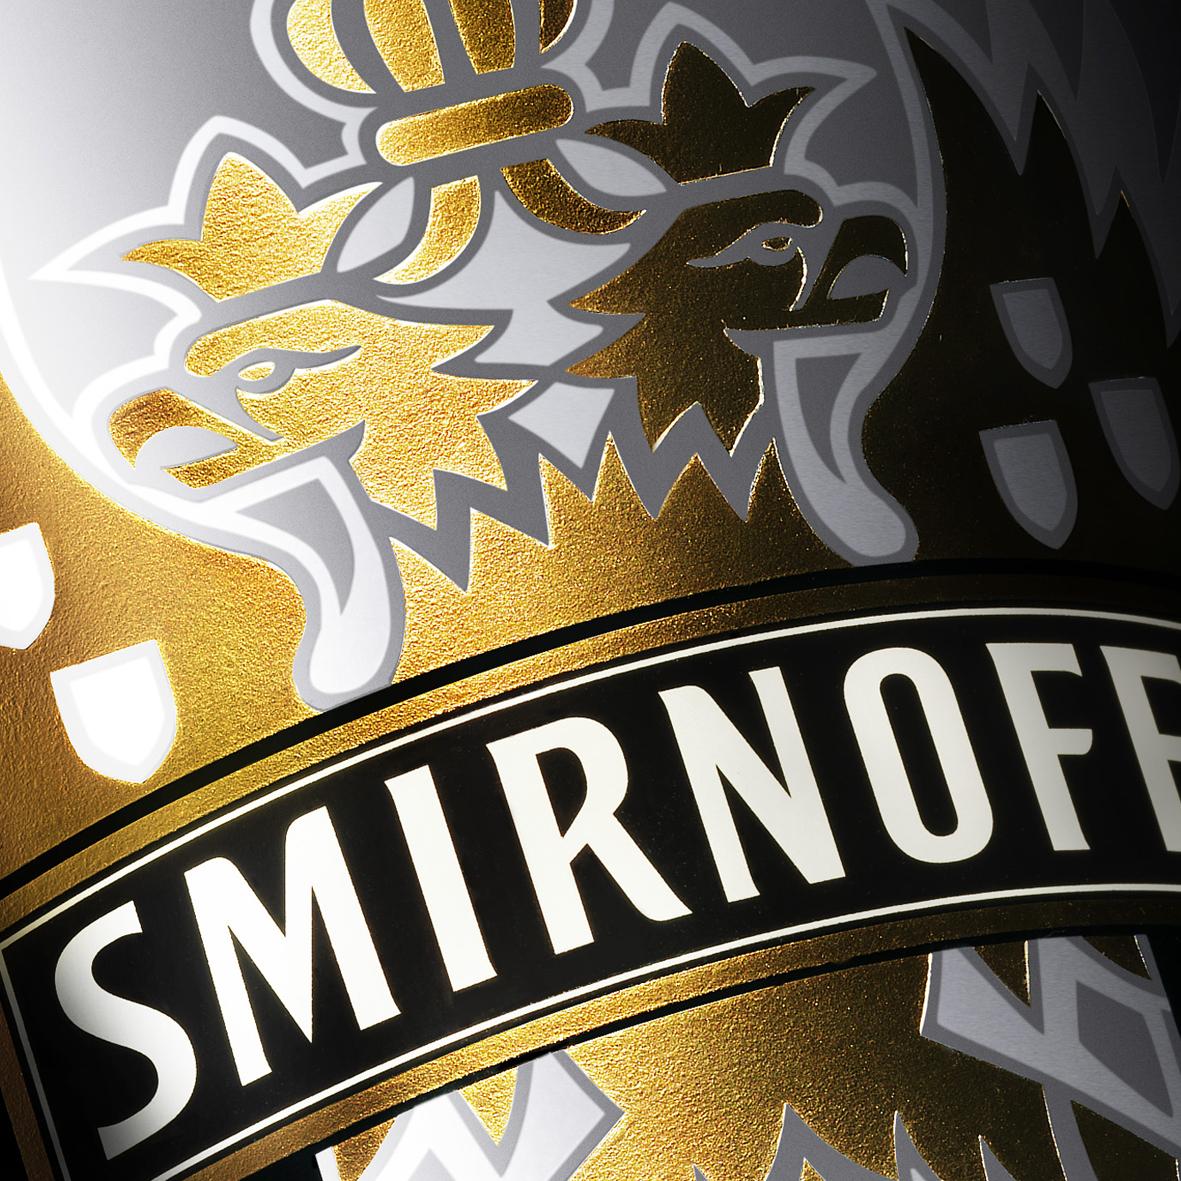 SmirnoffBlack-1